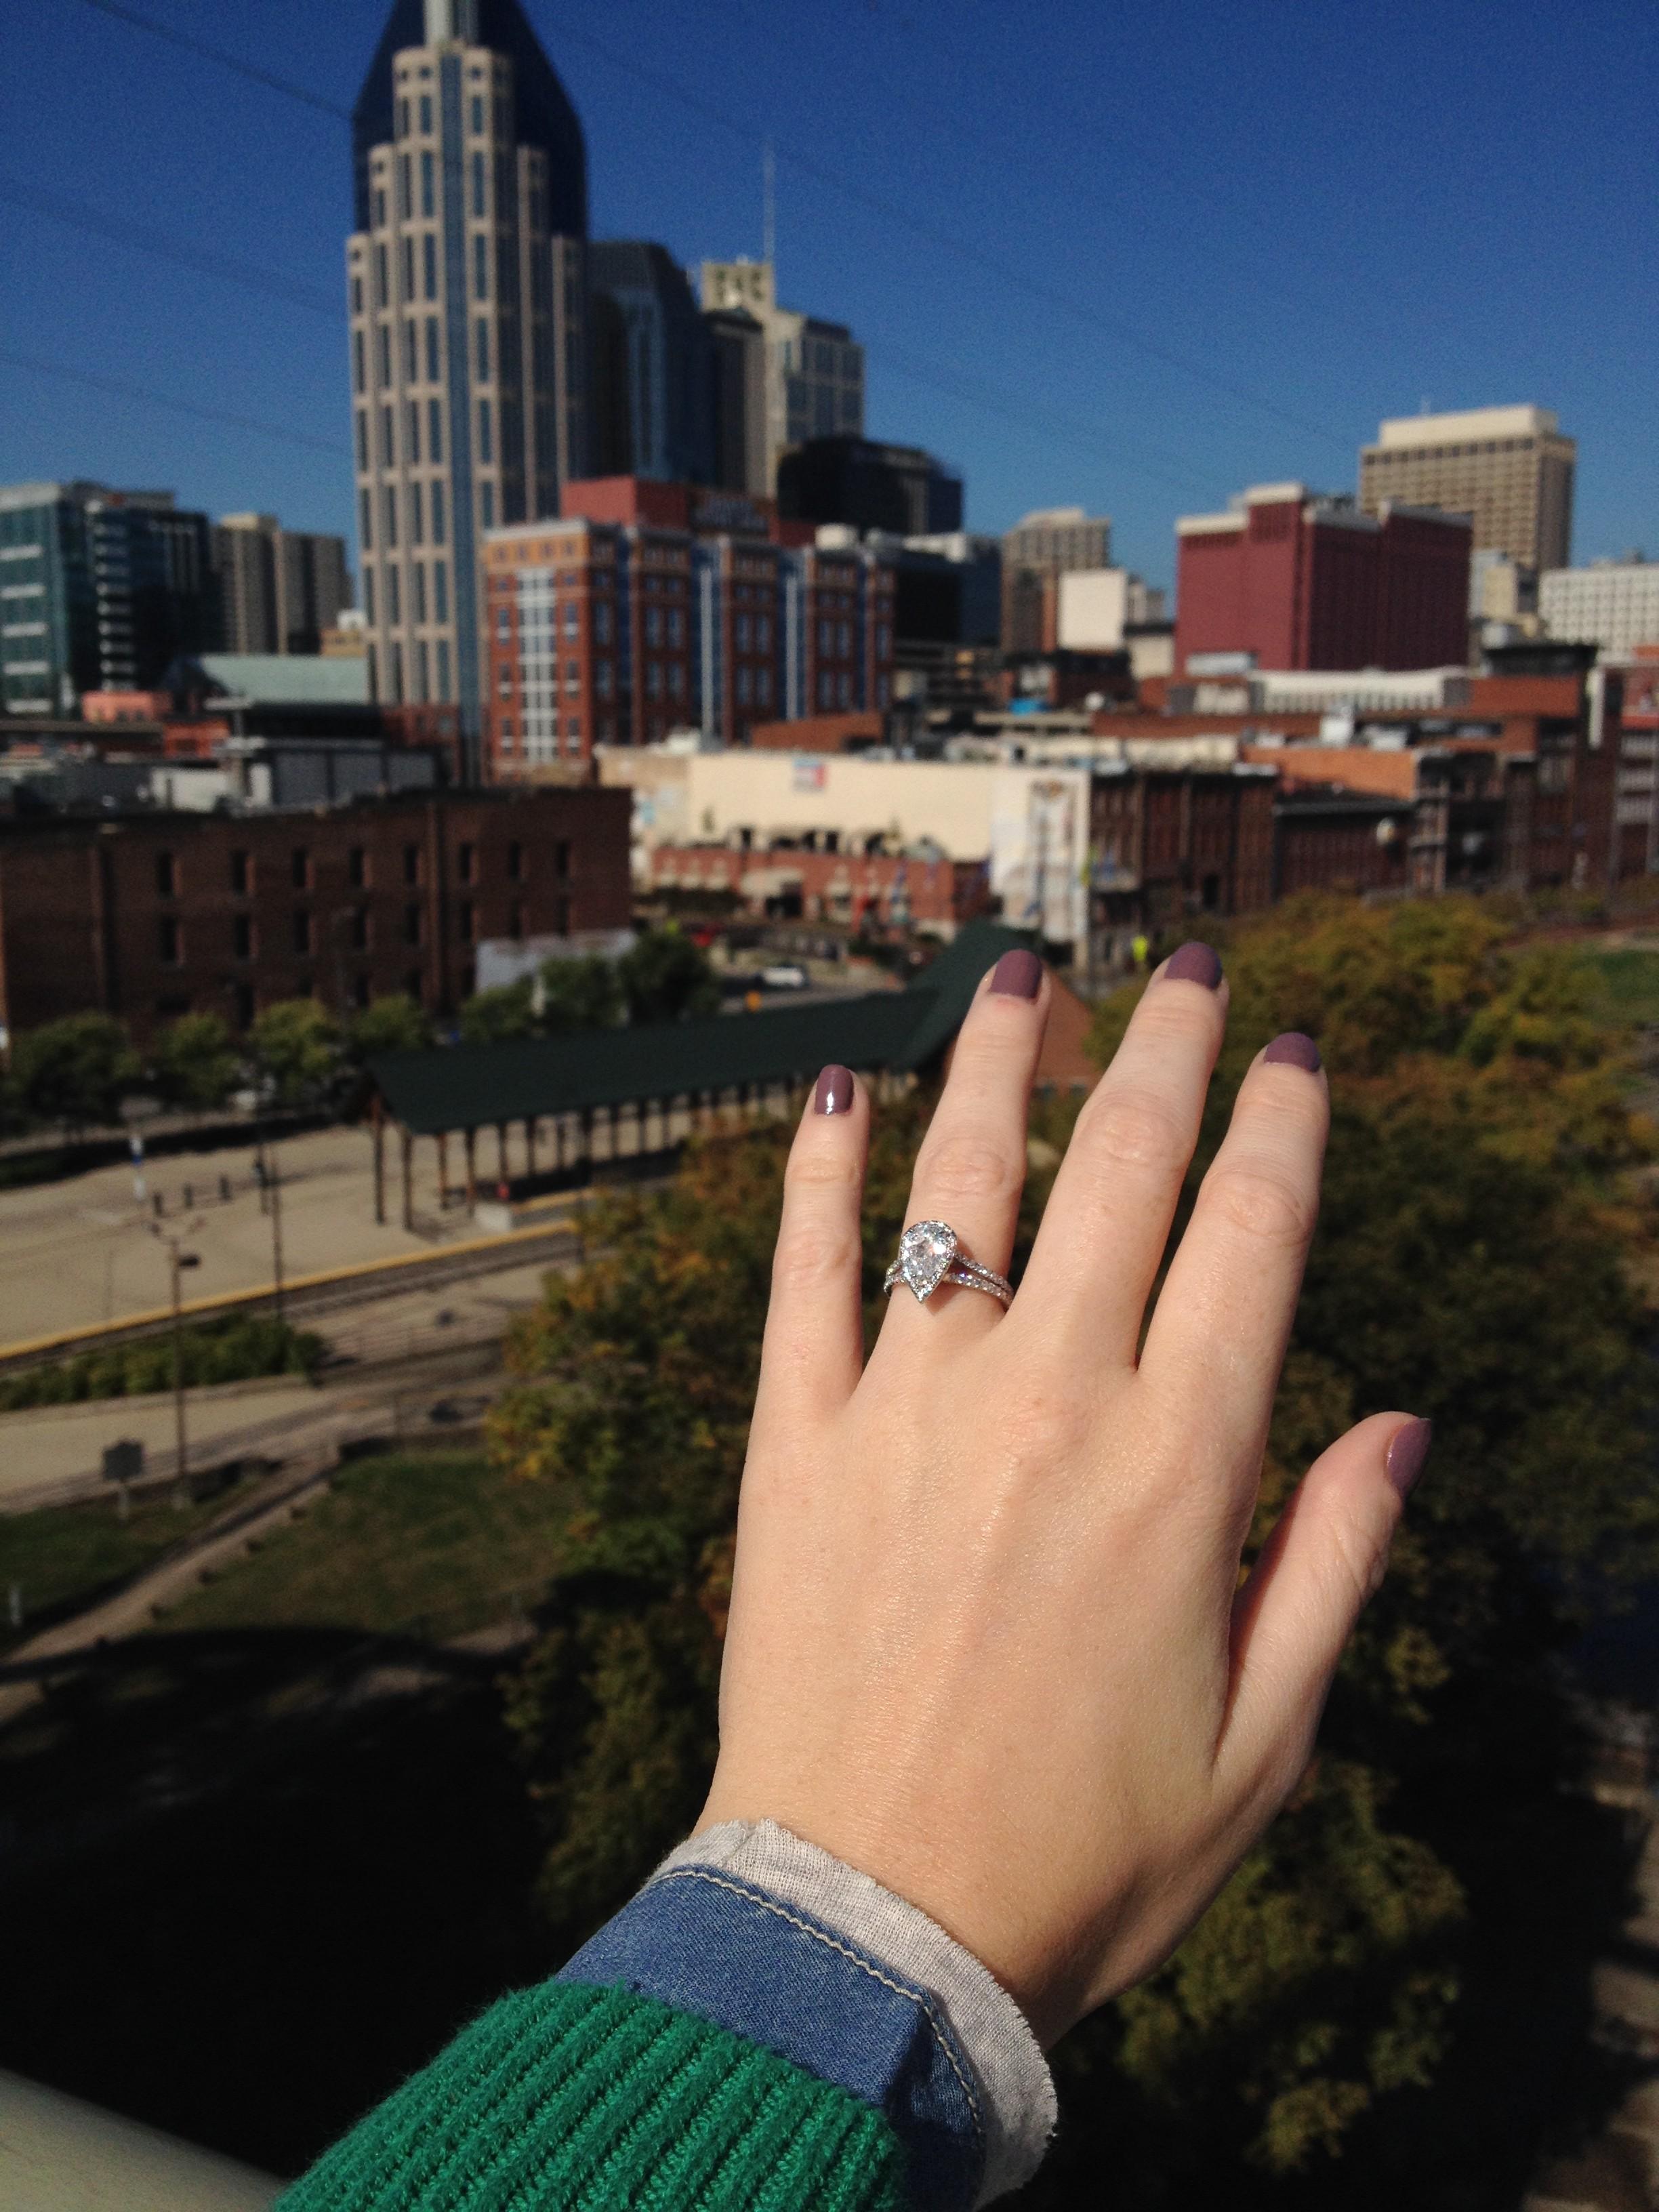 Image 10 of Autumn and John's Nashville Marriage Proposal